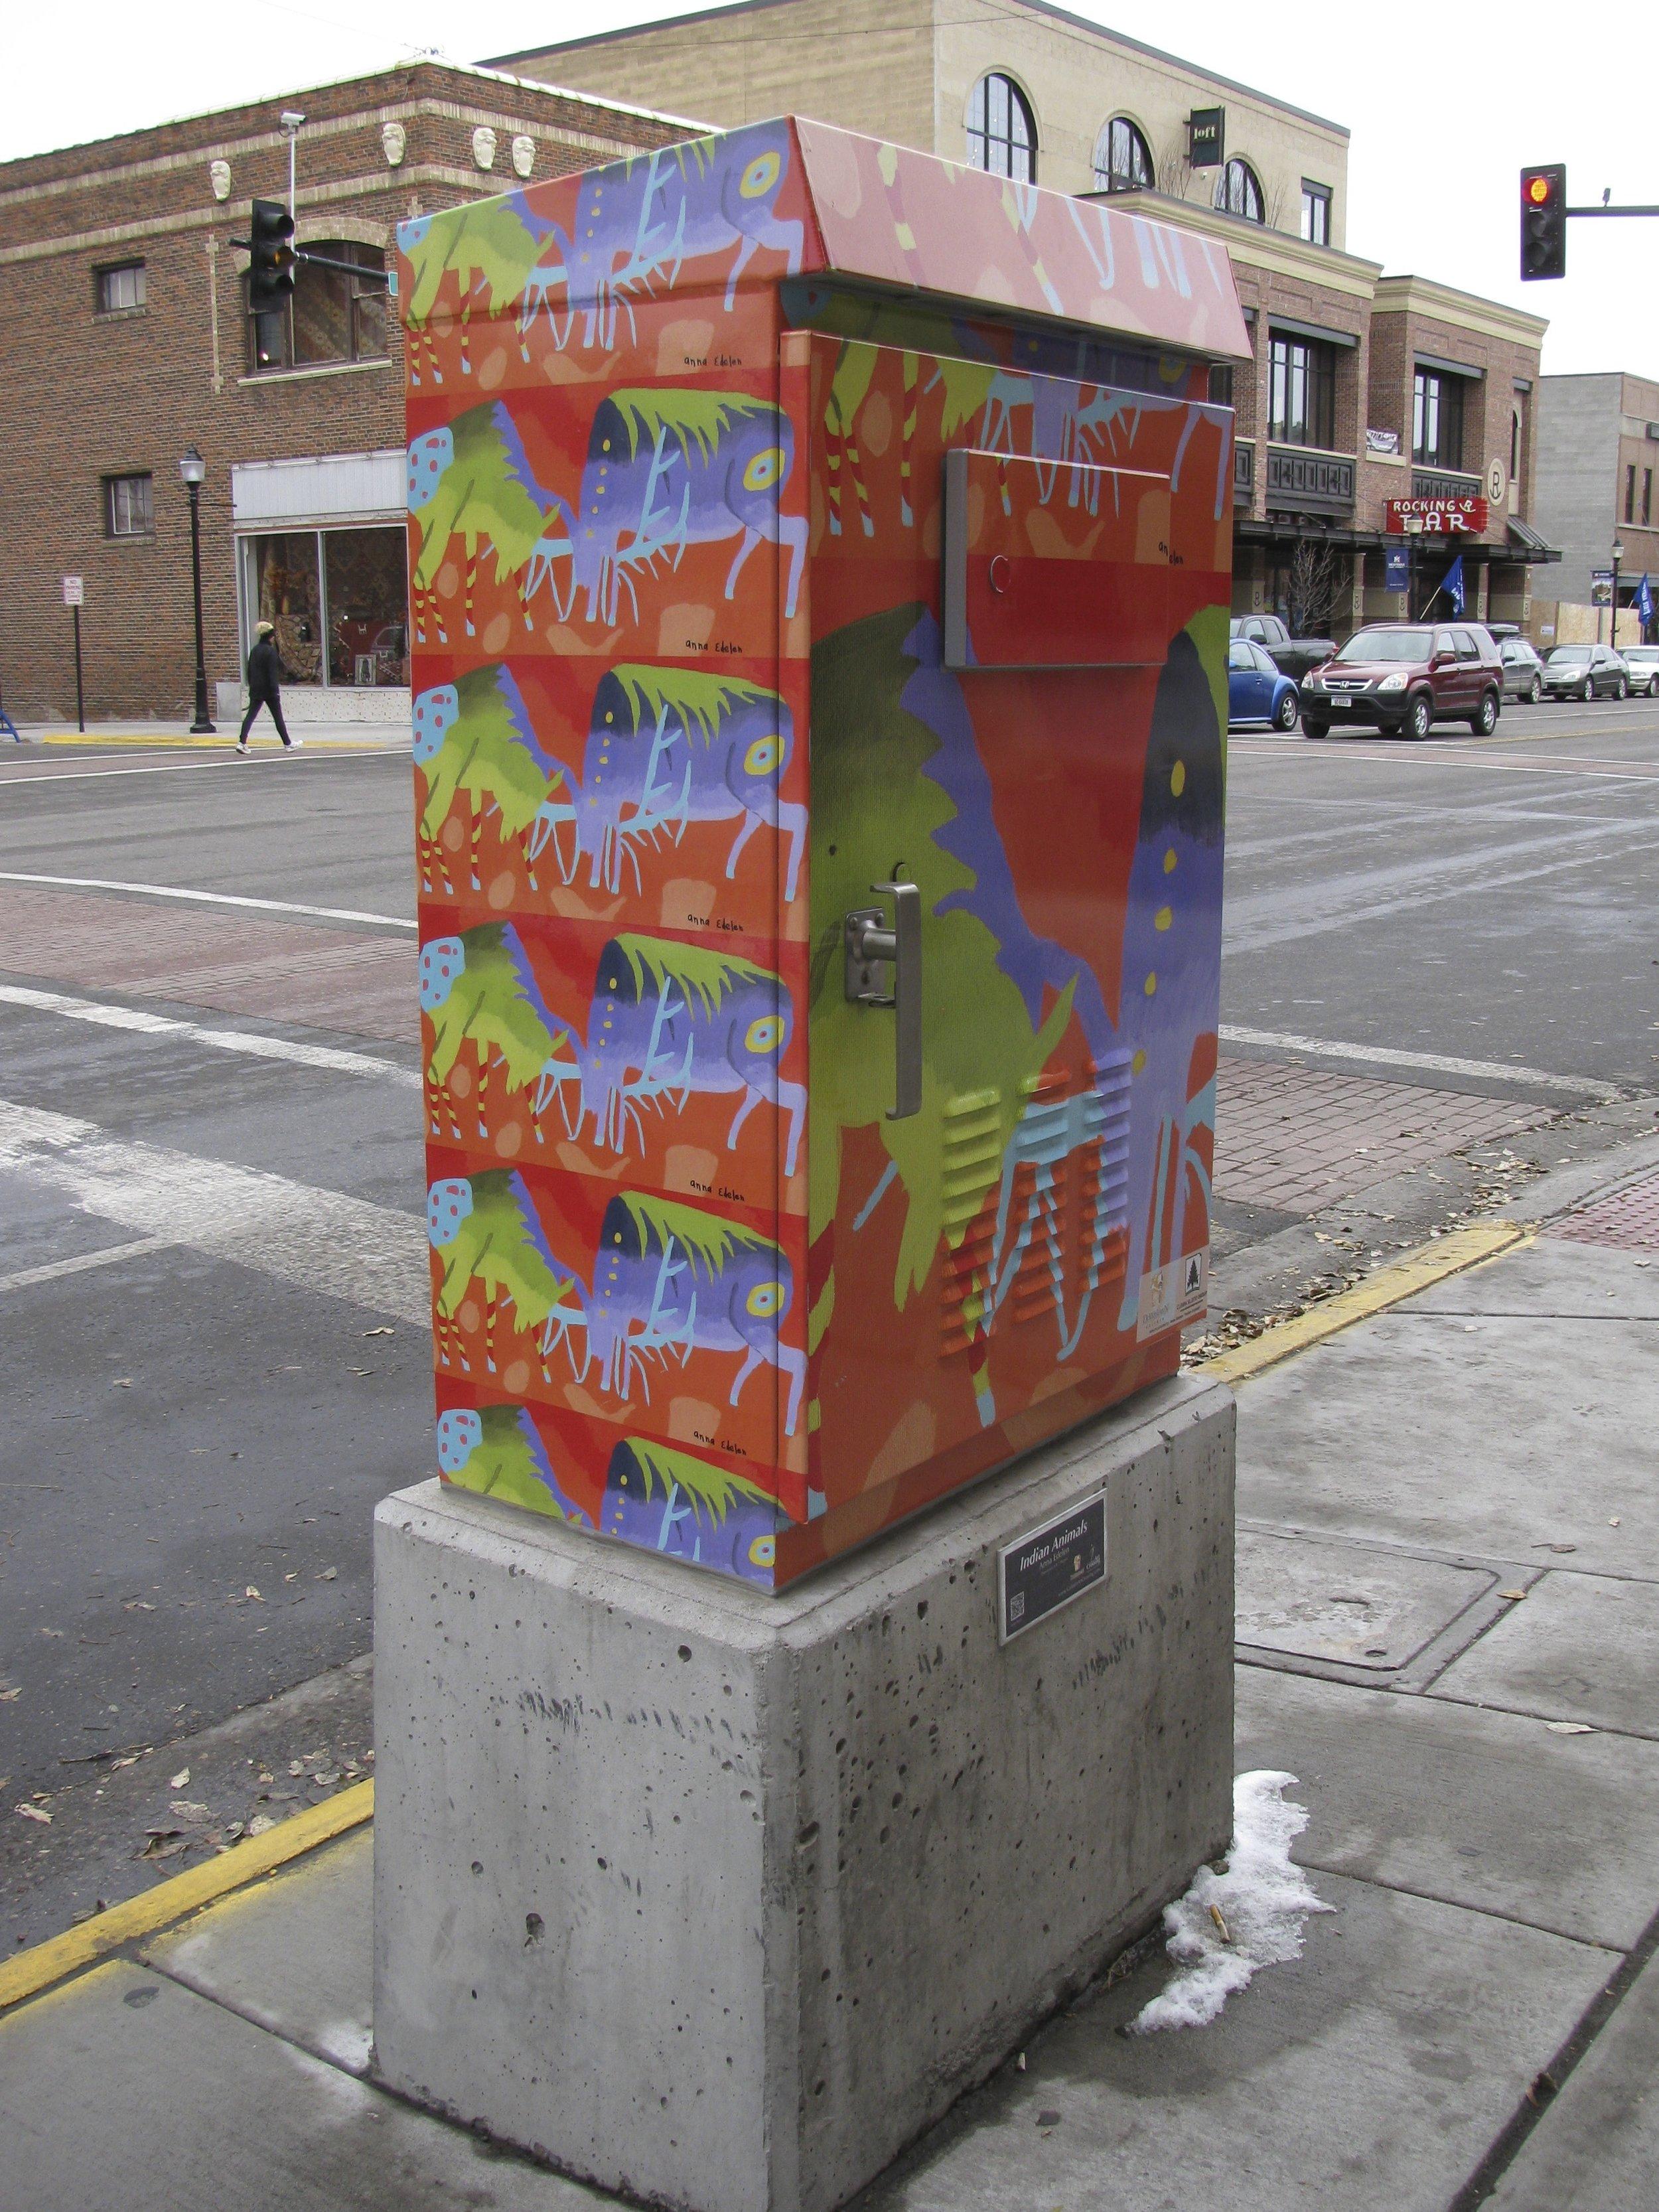 CleanSlateGroup_GraffitiResistant_Bozeman,MT_TrafficSignalBoxes_PhaseOneDowntown_Main&Bozeman_5.jpg